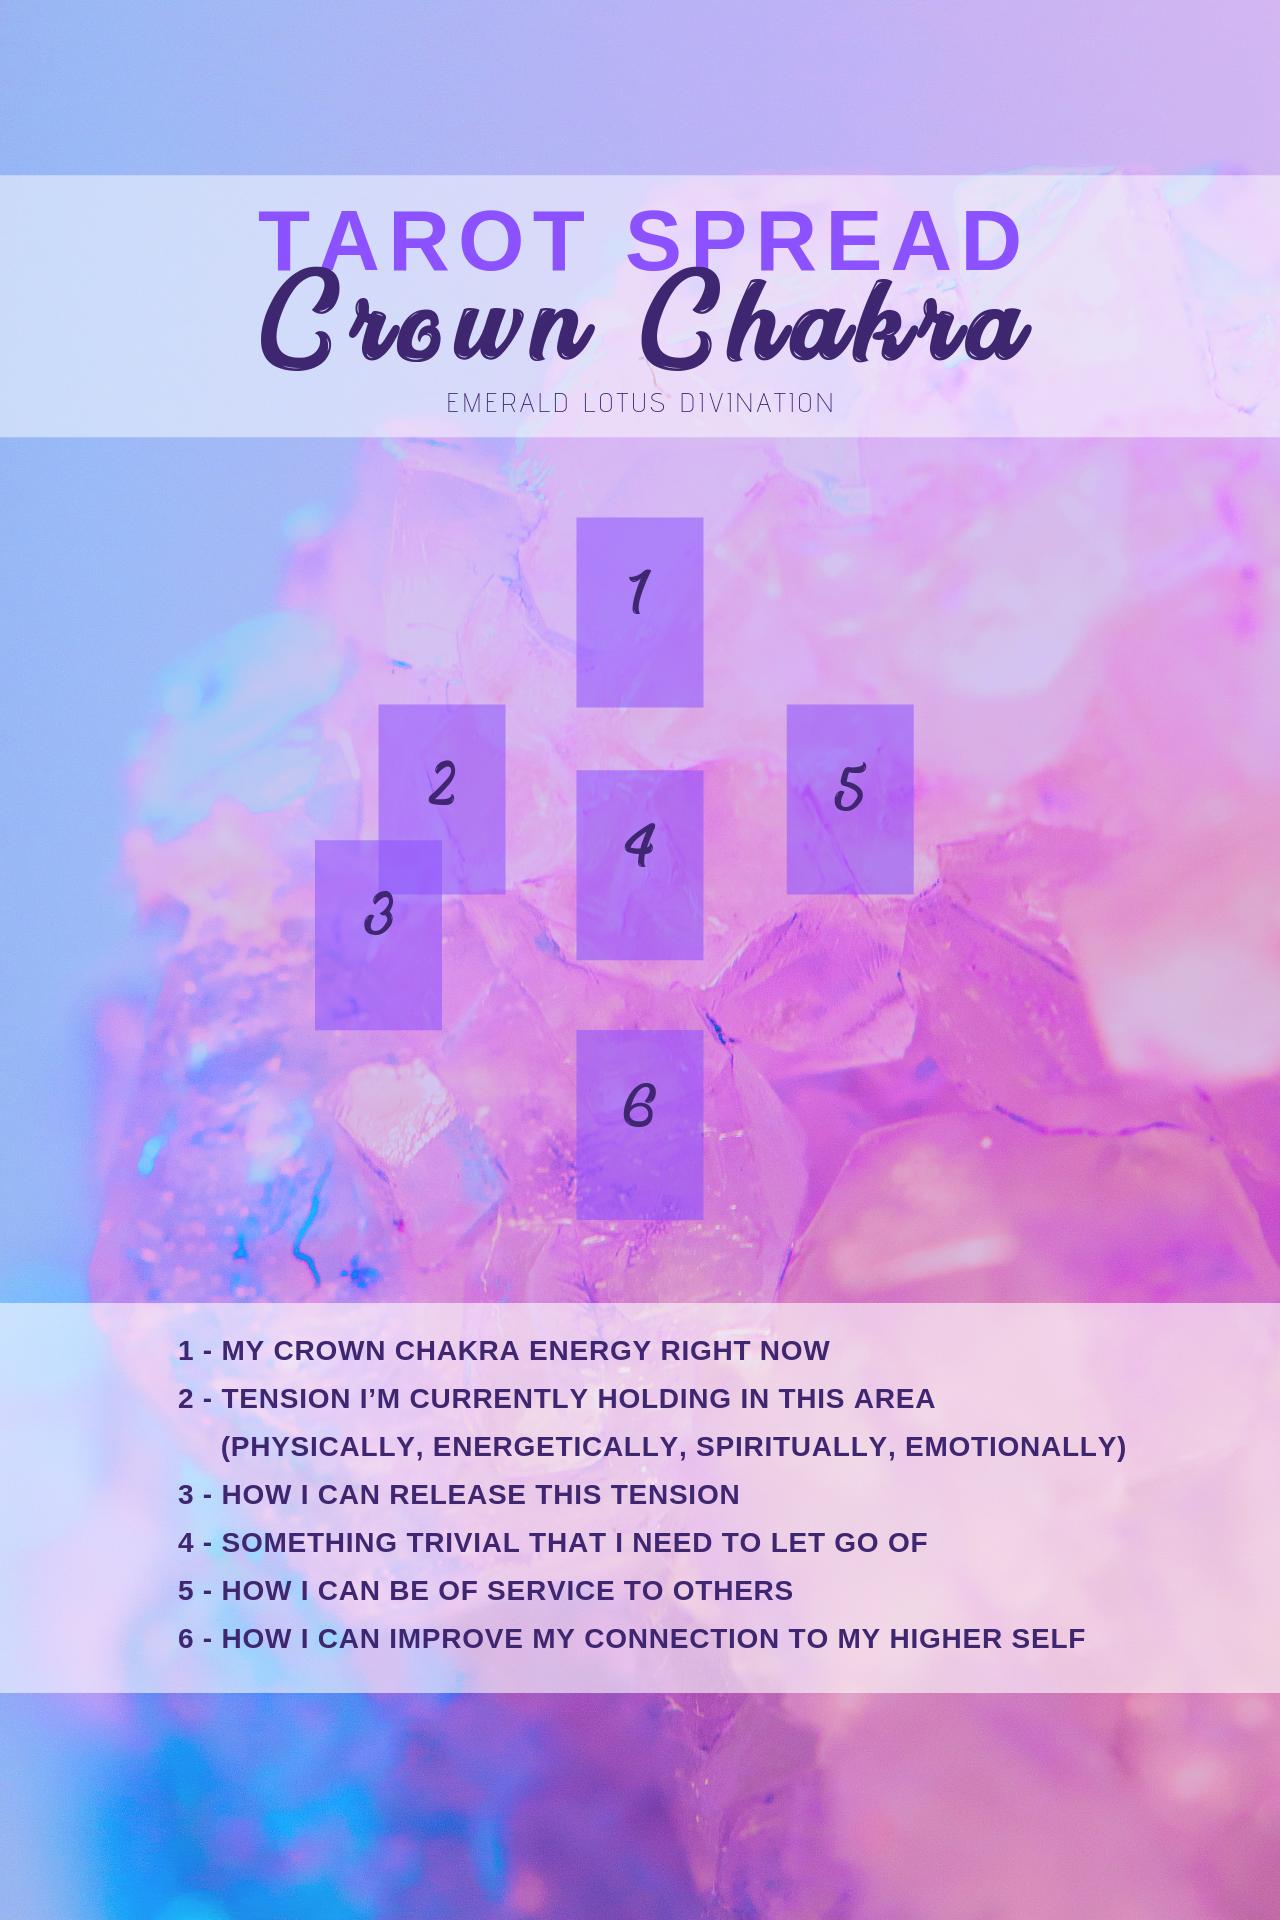 Crown-Chakra-Tarot-Spread-Emerald-Lotus.png